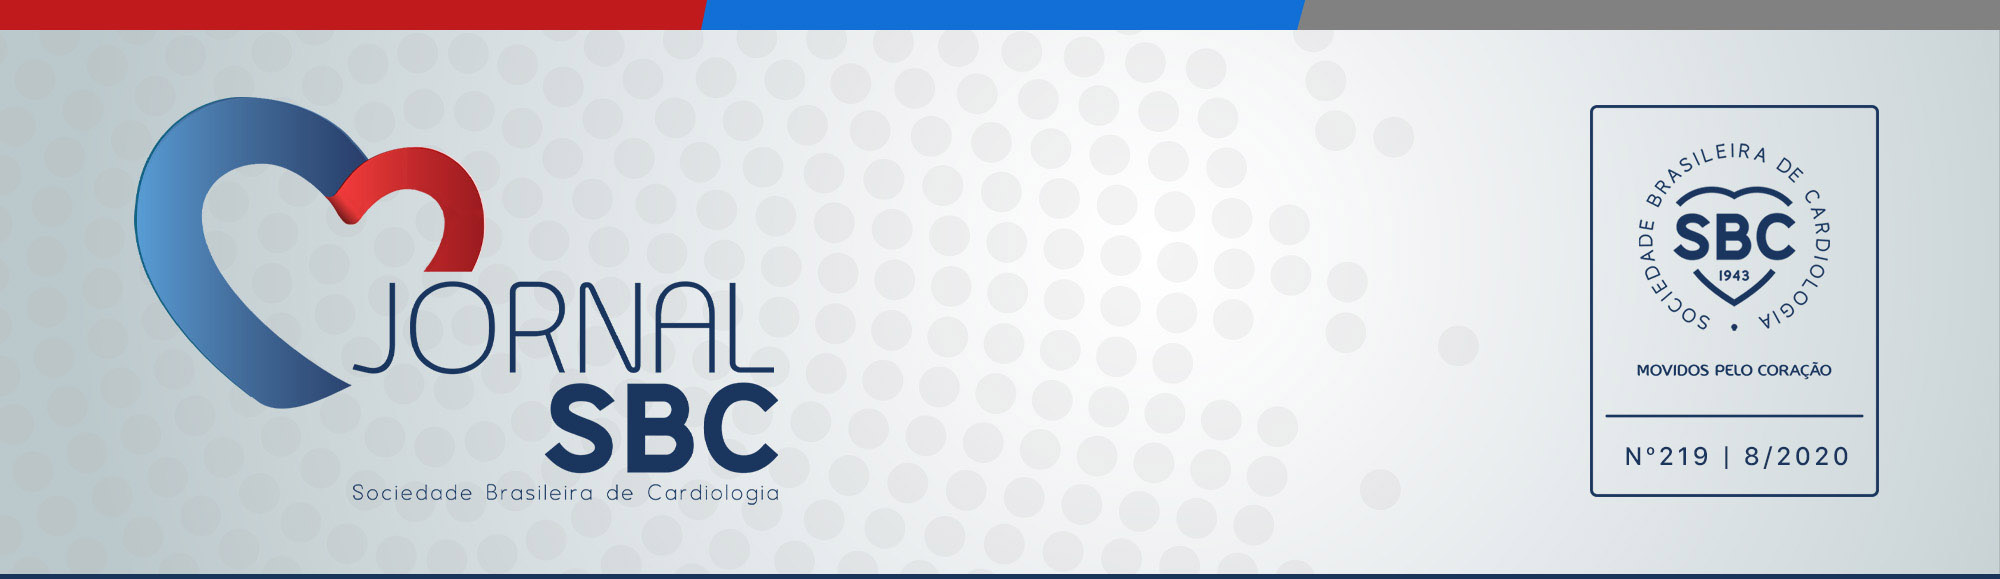 Jornal da Sociedade Brasileira de Cardiologia